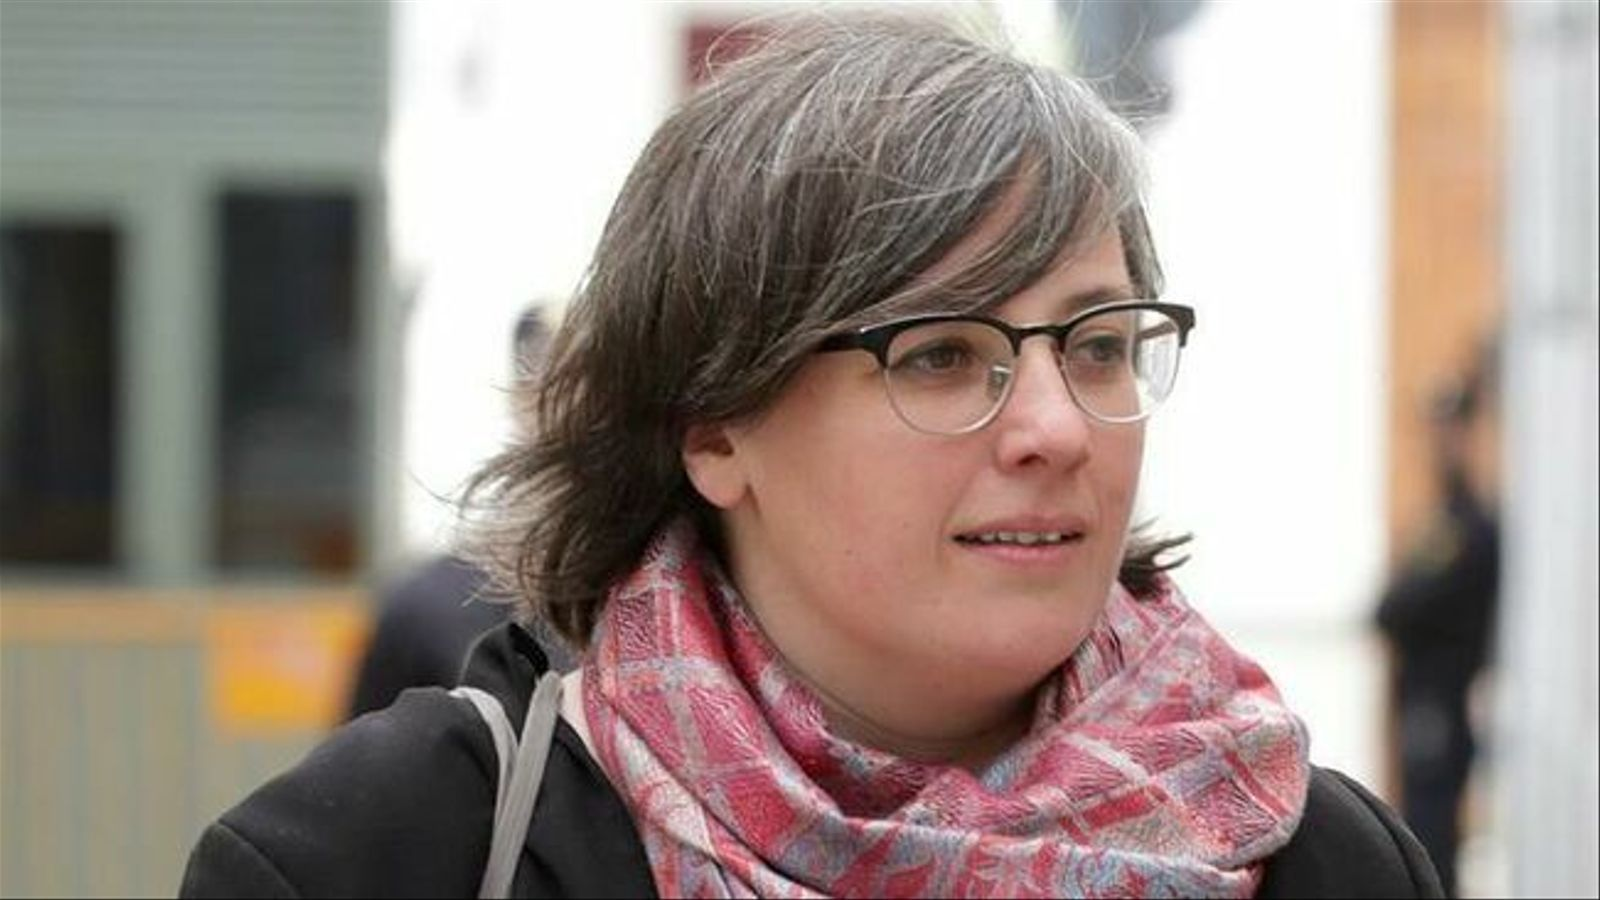 https://www.ara.cat/2019/03/29/politica/Mireia-Boya-CUP-psicologica-continuada_2205989559_61572245_651x366.jpg